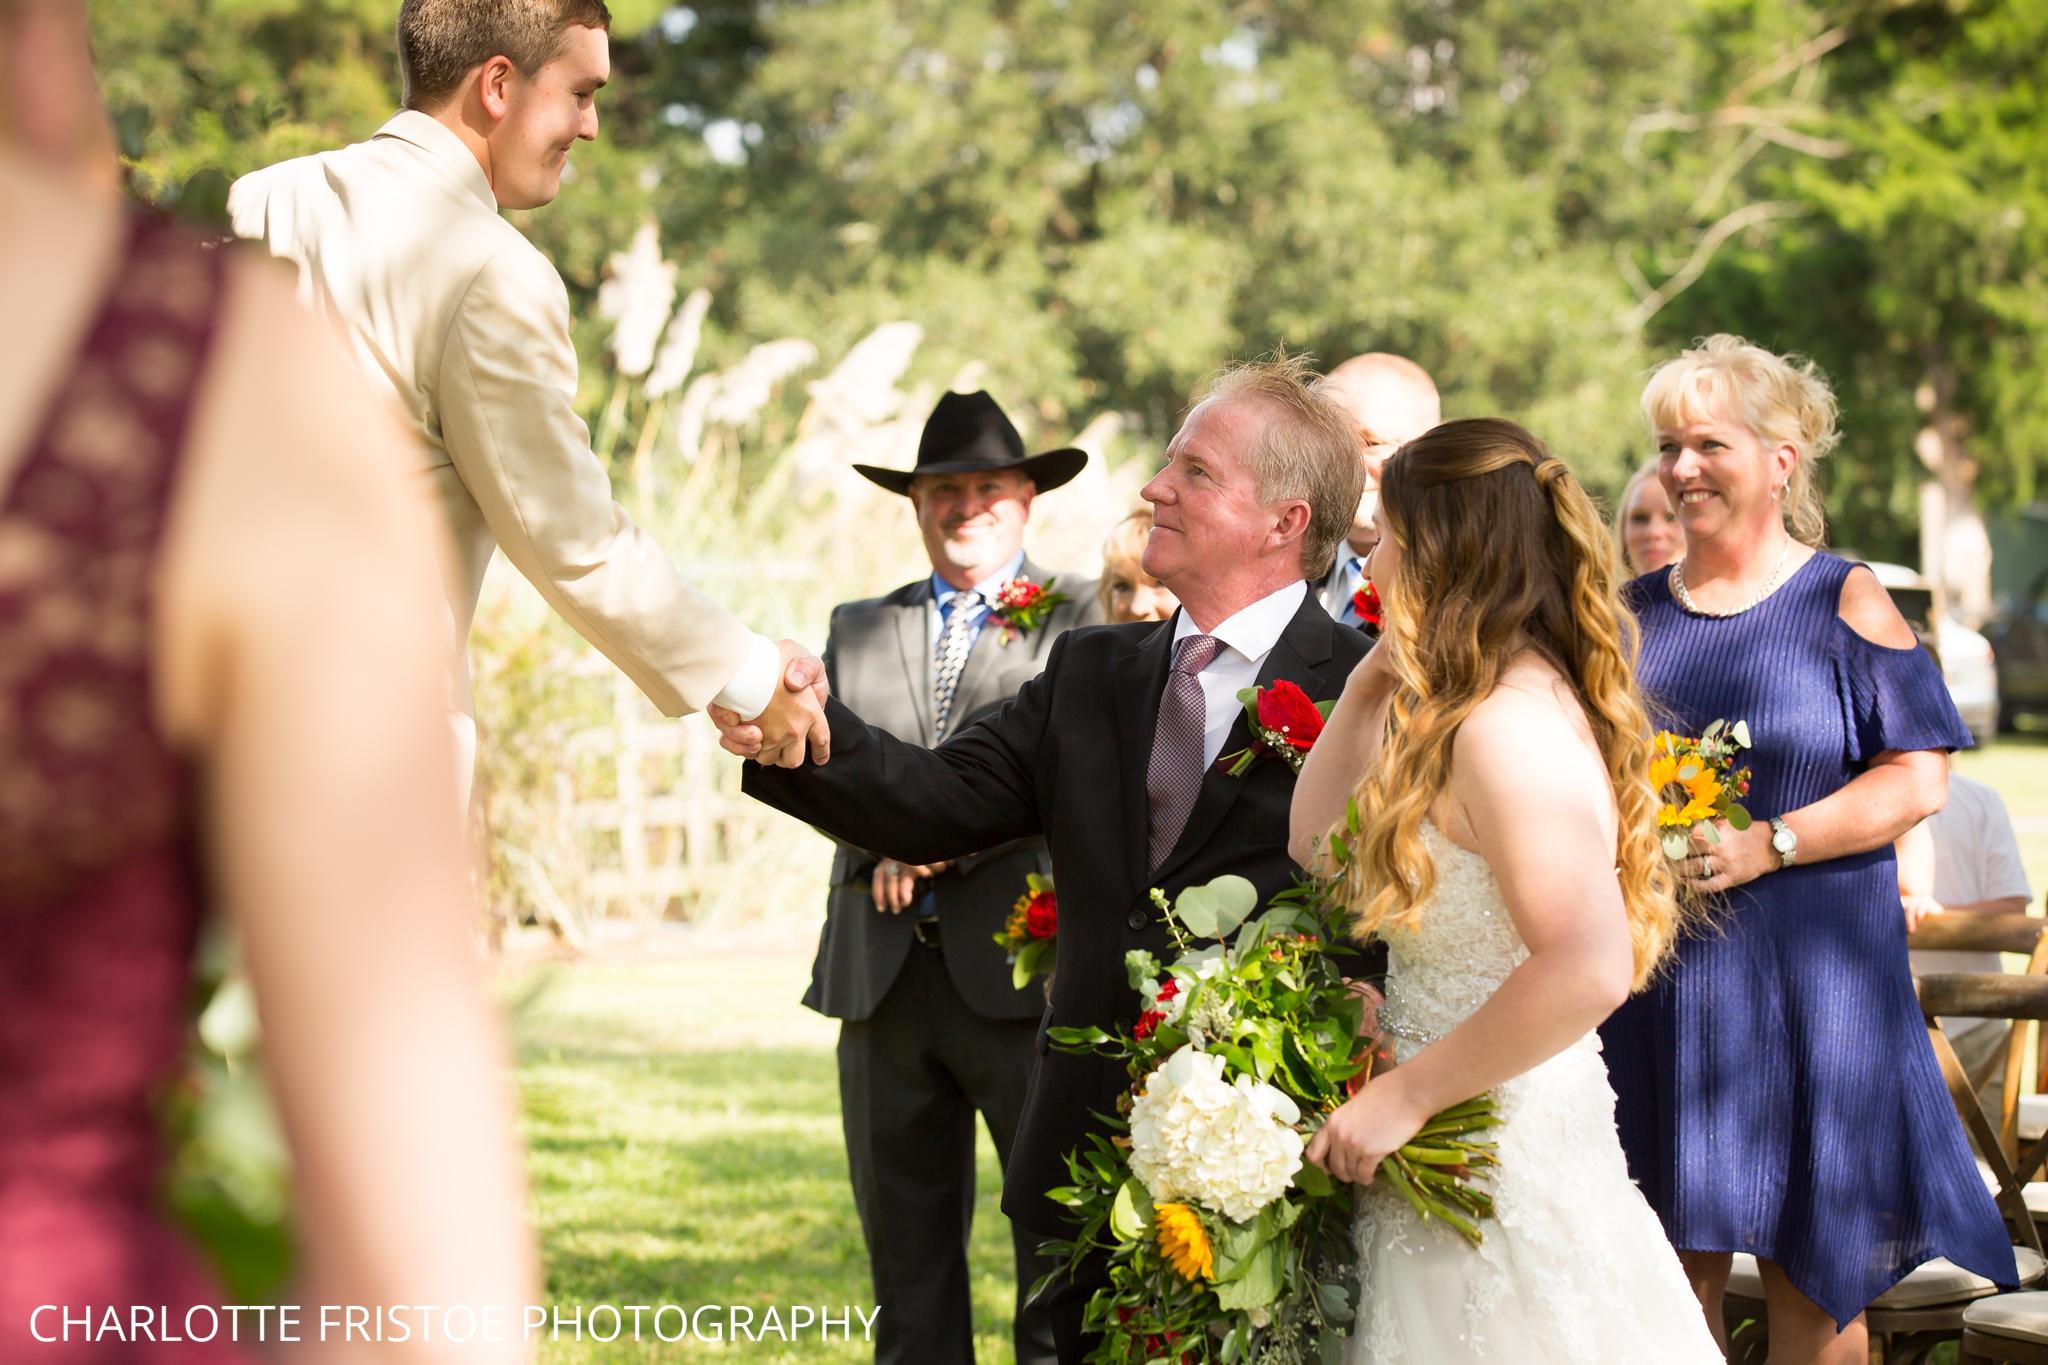 Tallahassee_Wedding_Charlotte_Fristoe-35.jpg